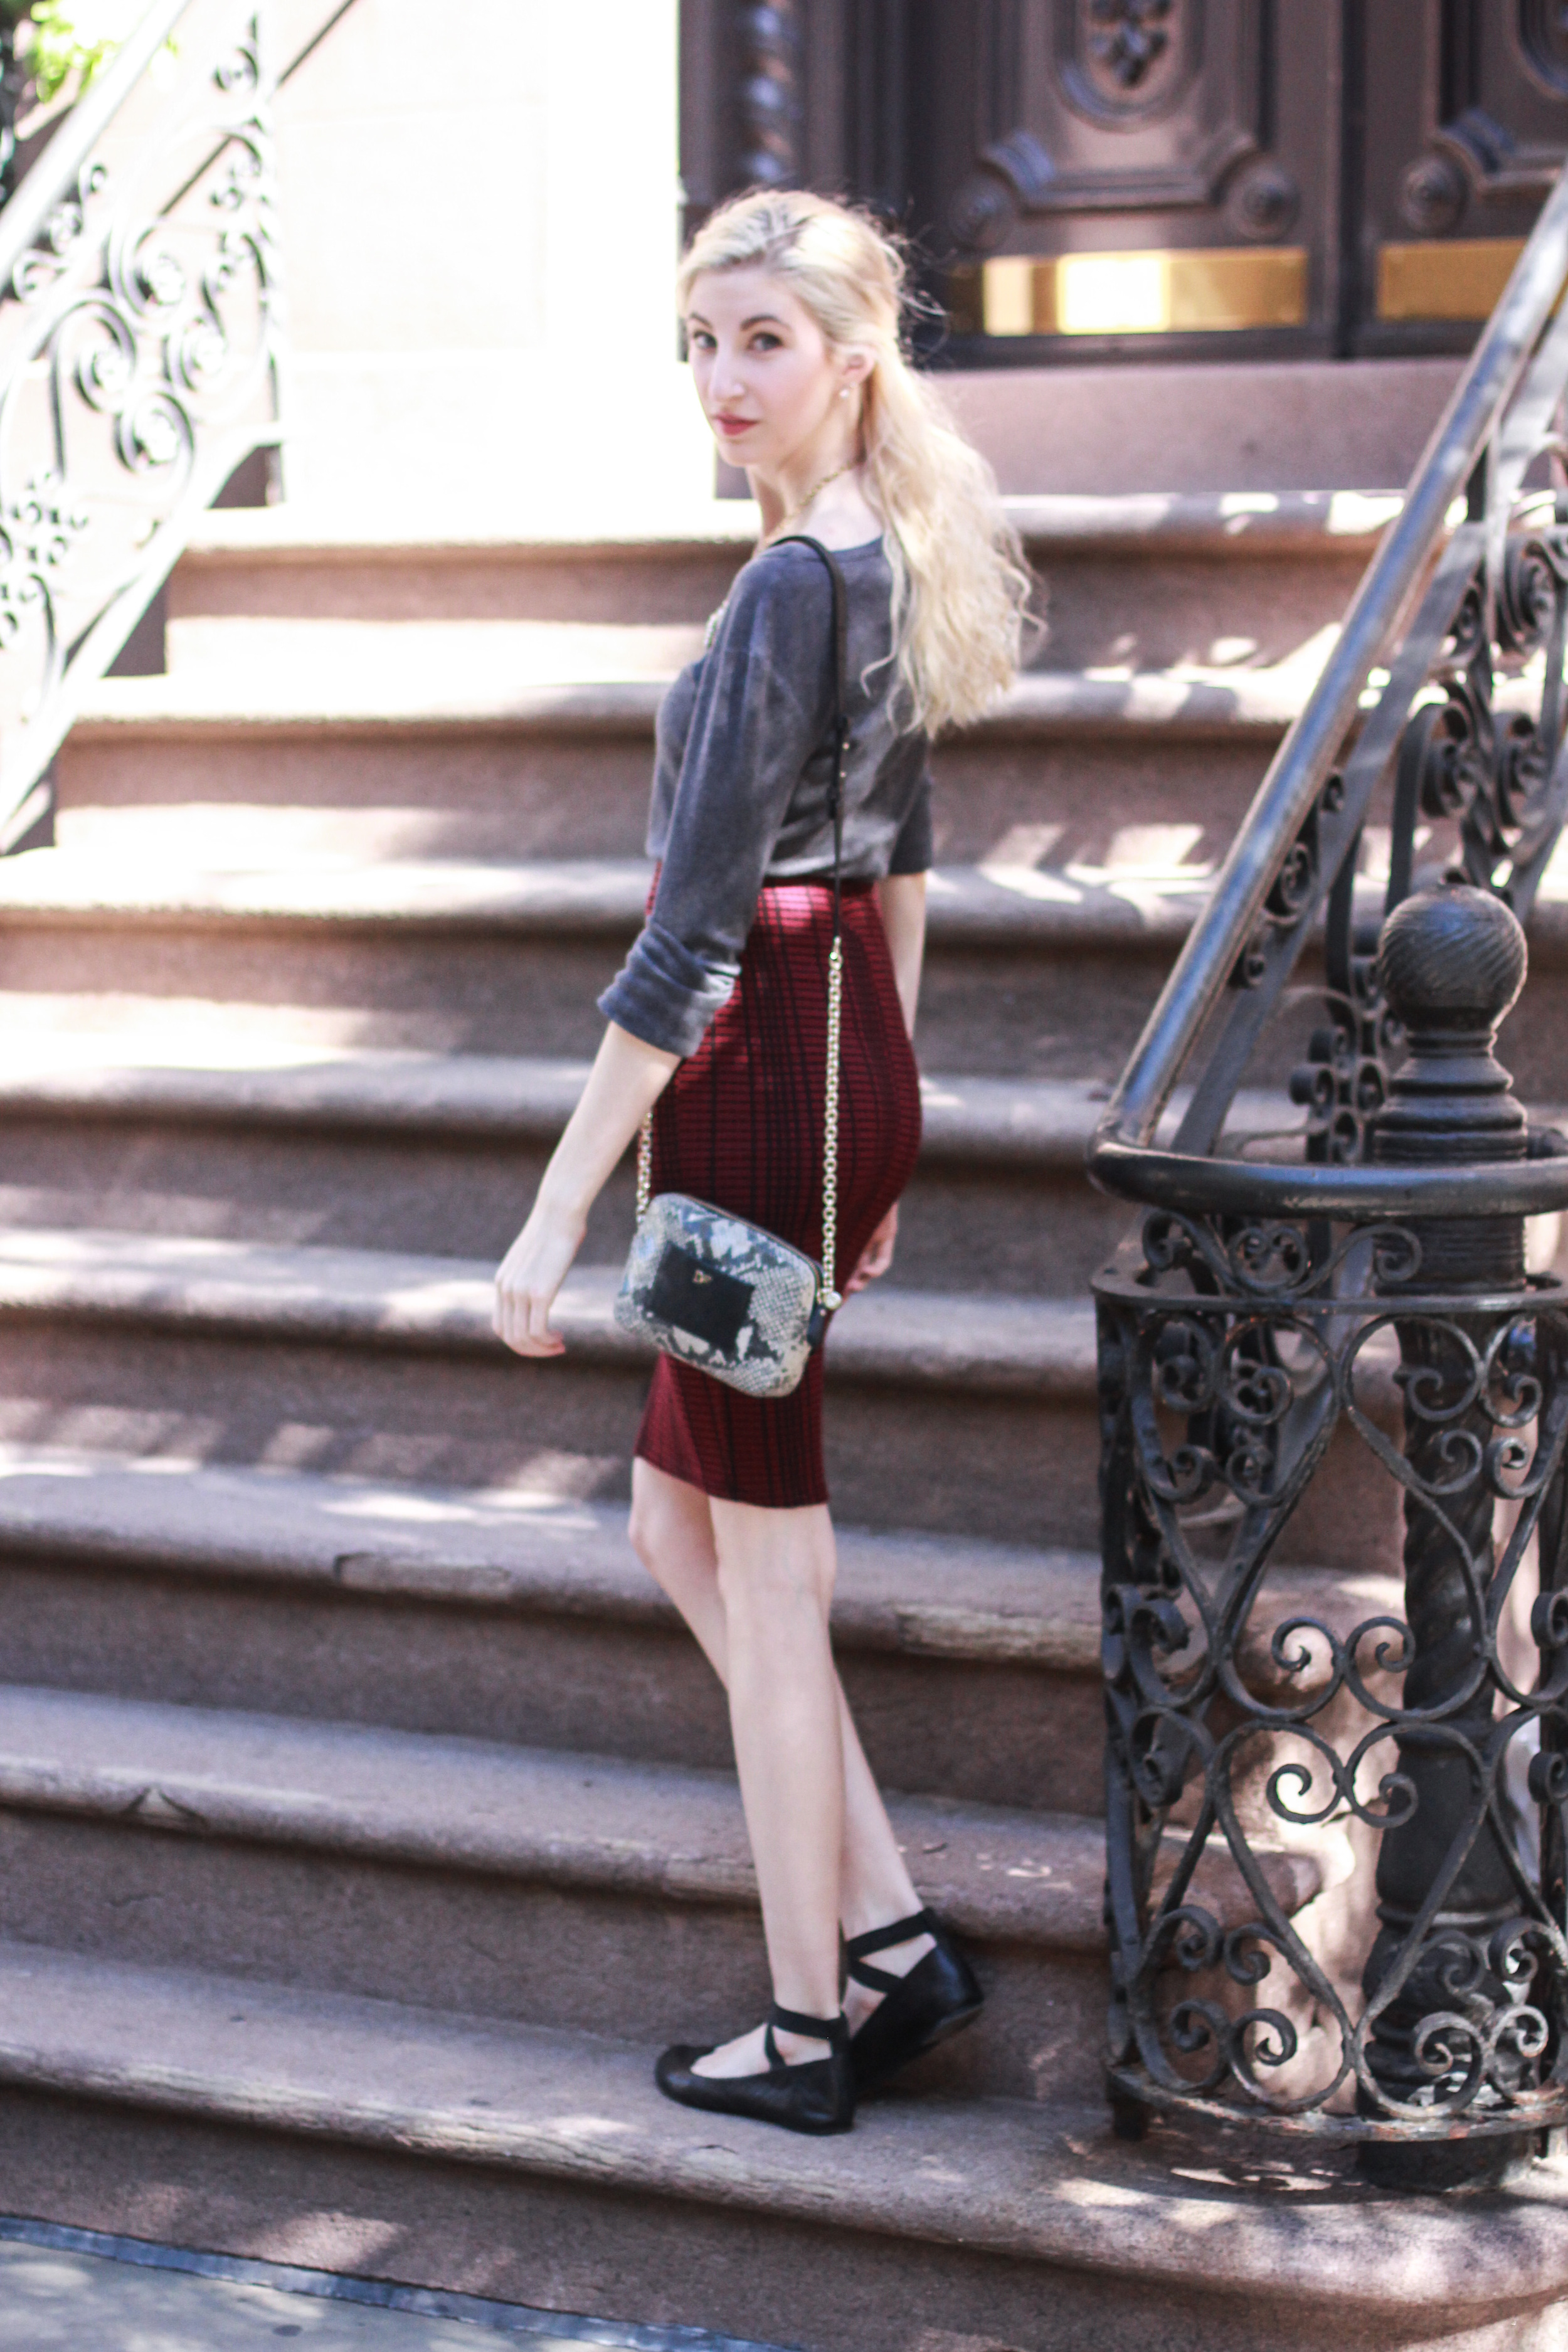 GAP grey longsleeve tee, audrey brooke black ballet flats, J.Crew crystal statement necklace, red Lush midi pencil skirt